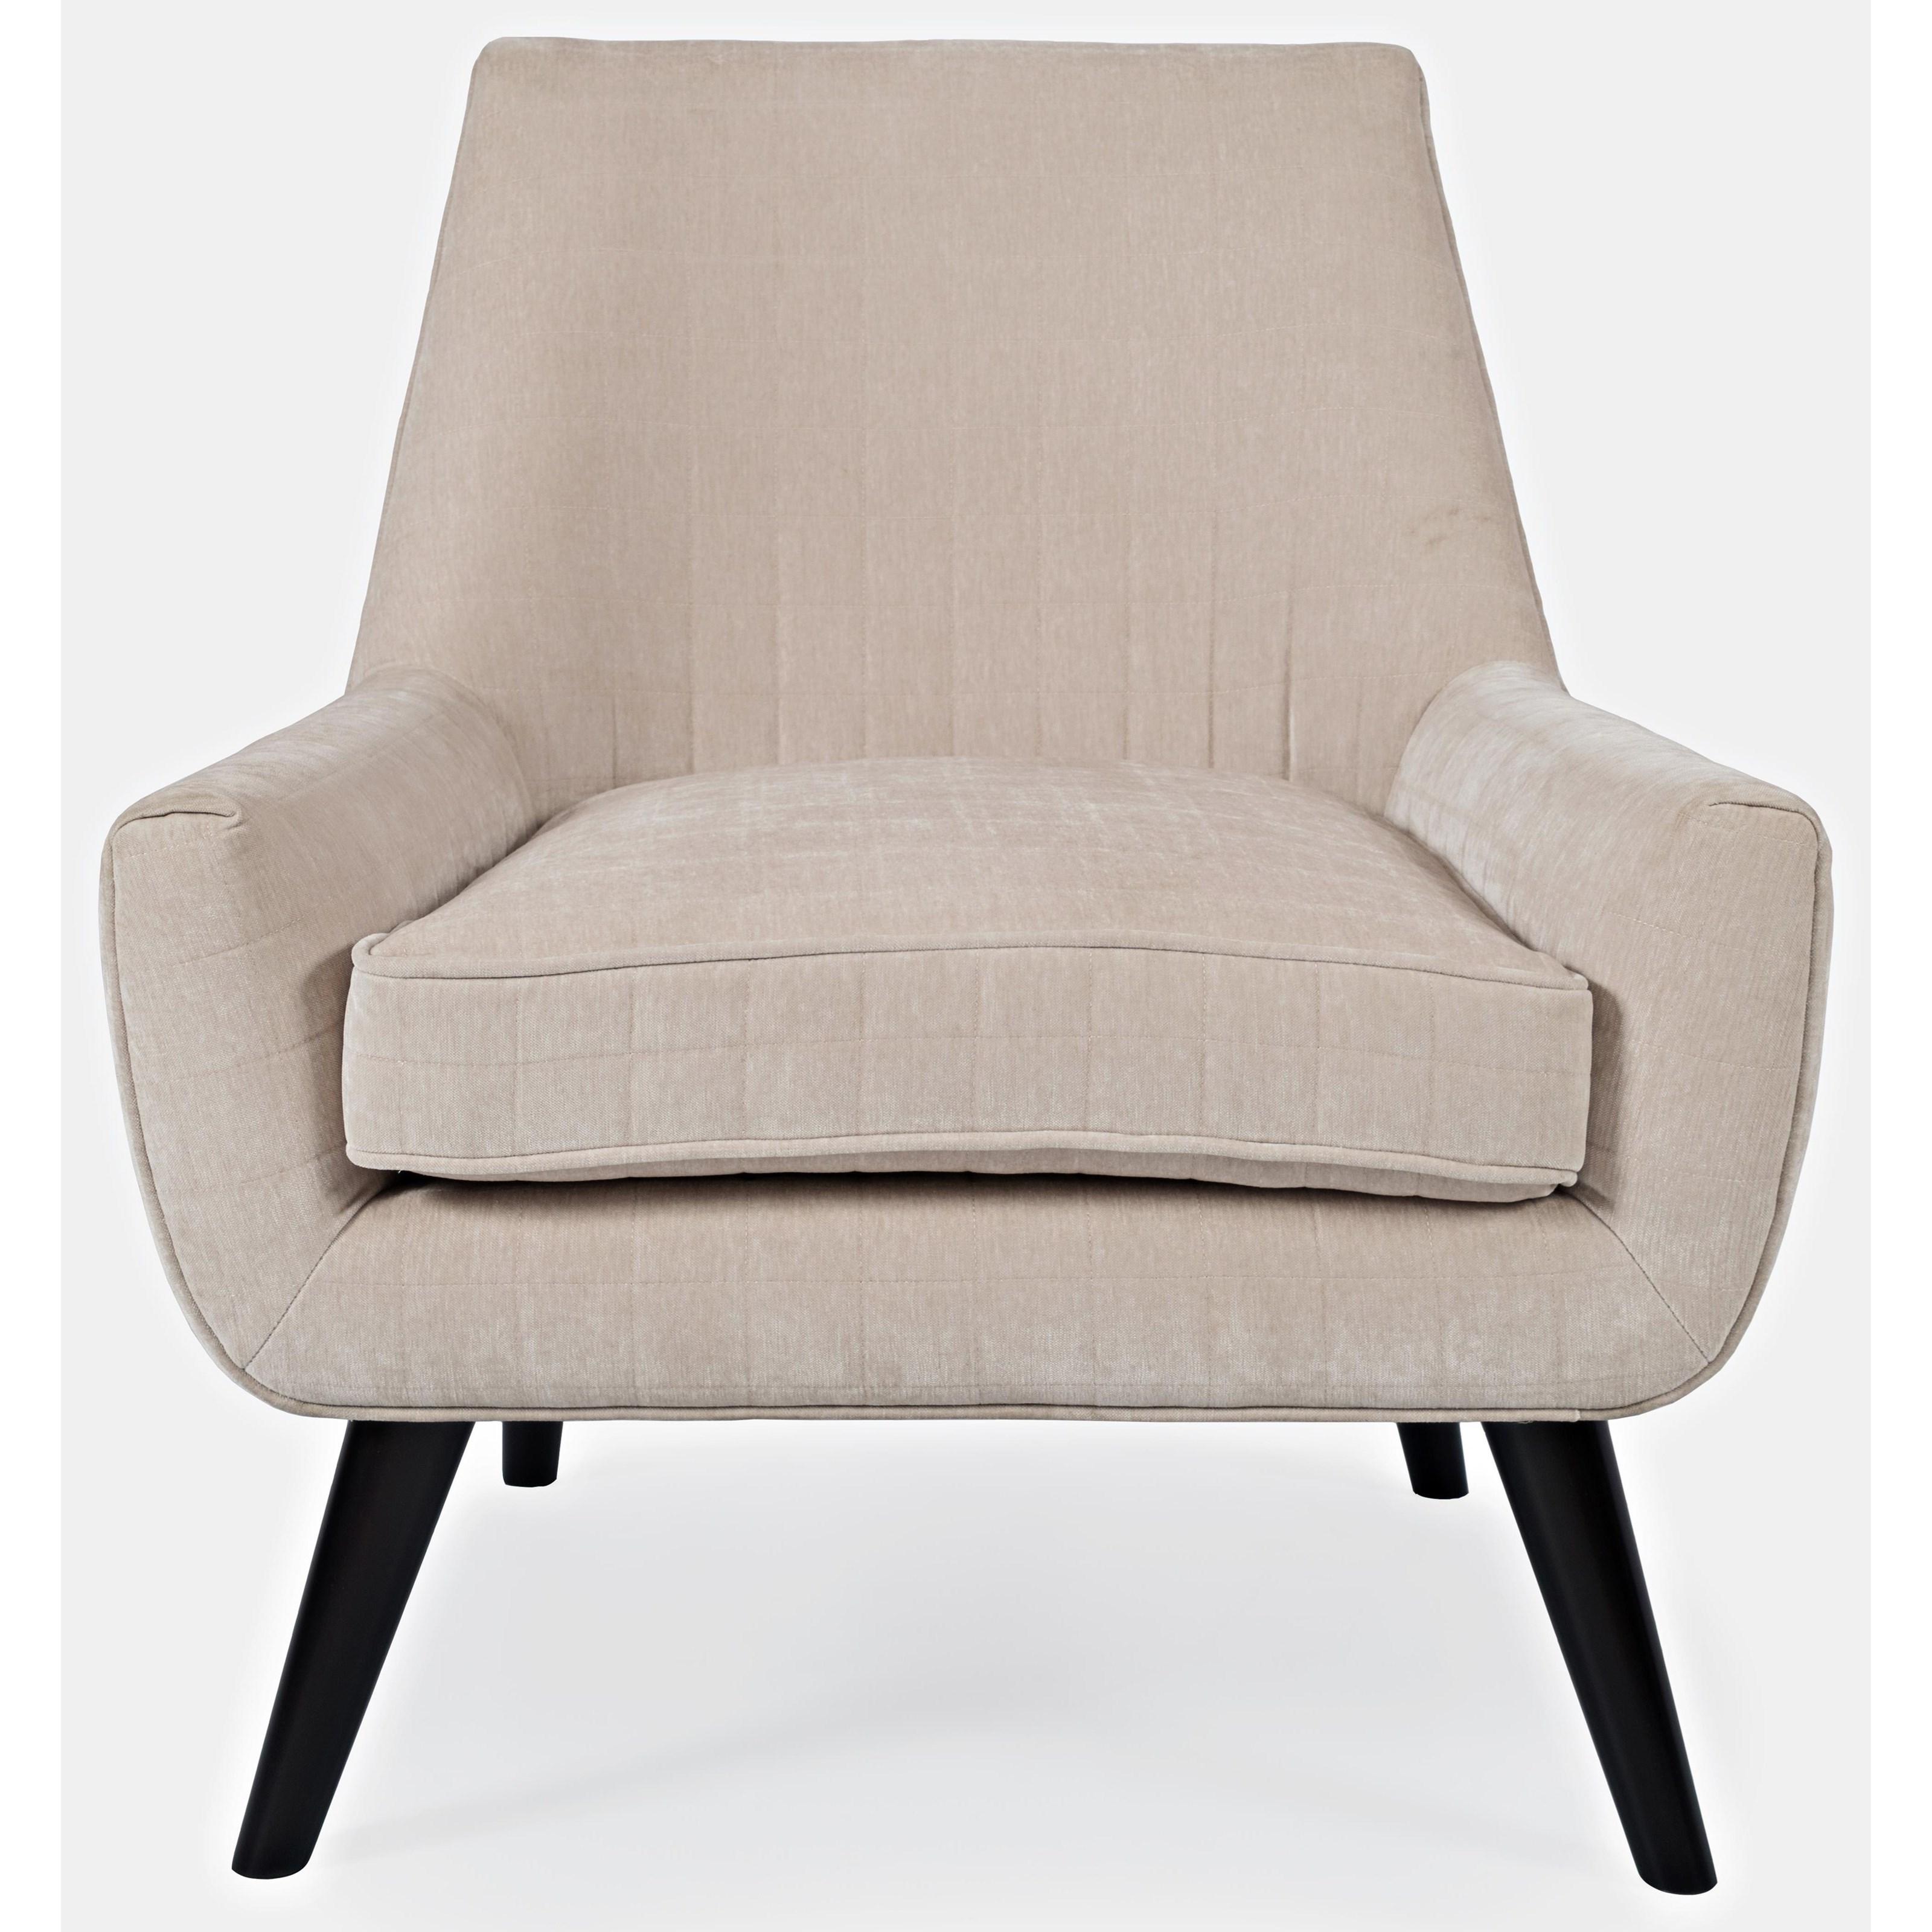 Lorenzo Lorenzo Chair by Jofran at Jofran